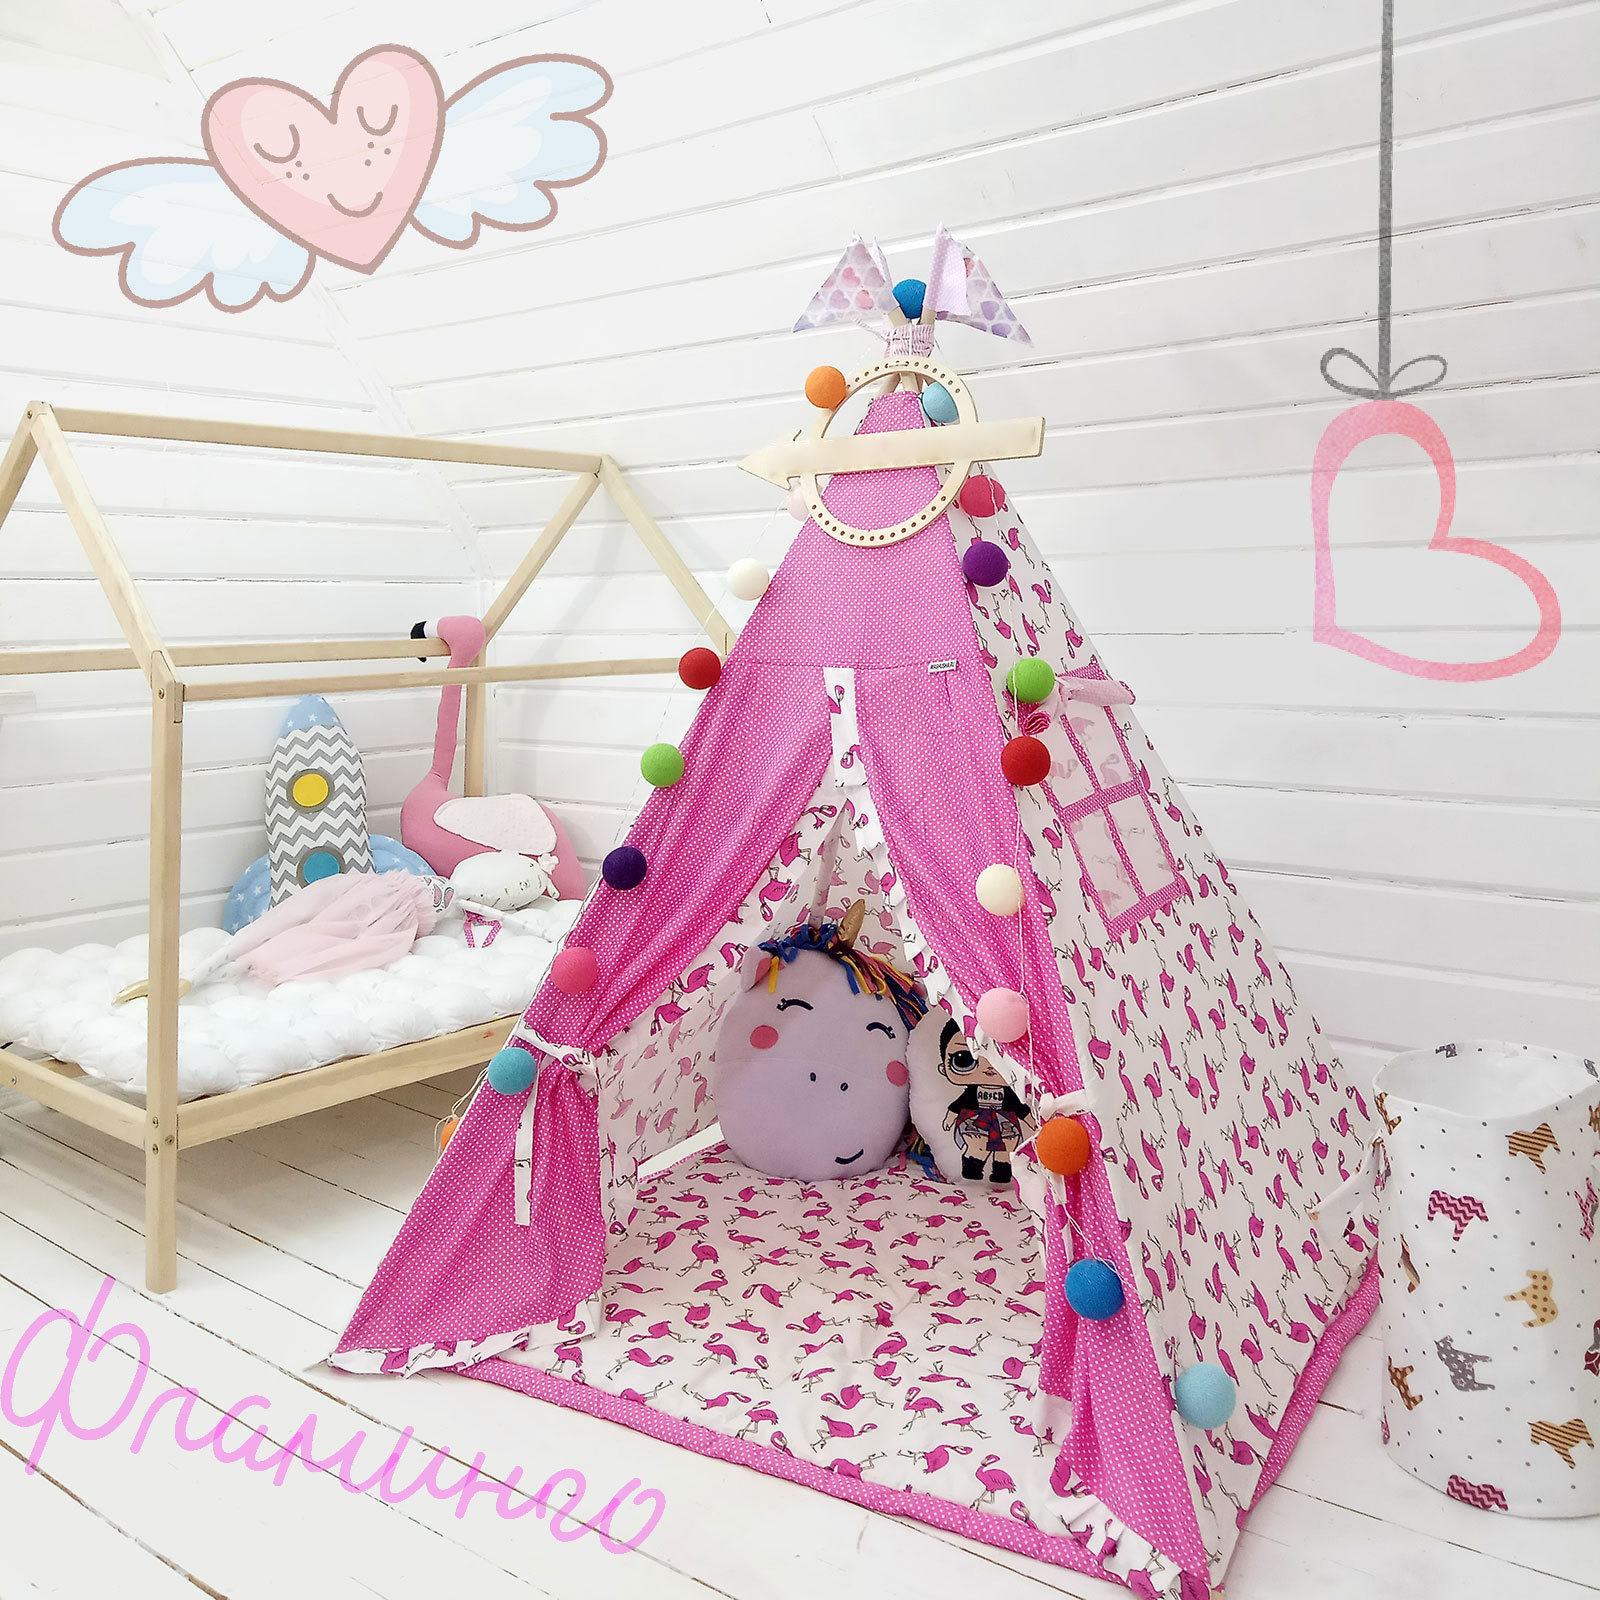 "Палатка ВигВам для детей ""Фламинго"""